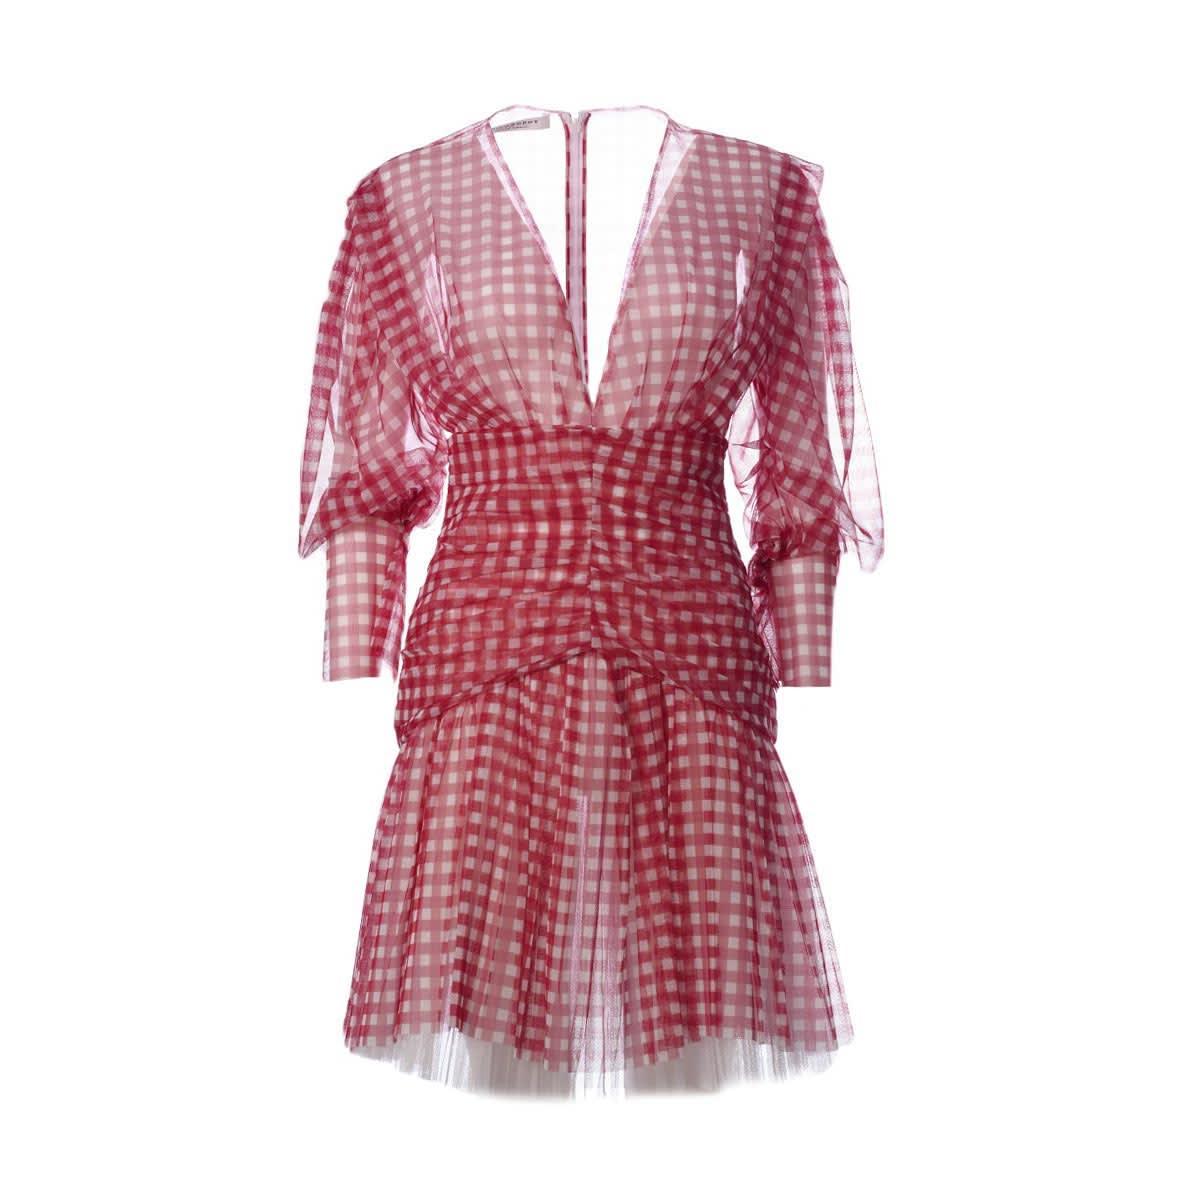 Buy Philosophy di Lorenzo Serafini Check Print Dress online, shop Philosophy di Lorenzo Serafini with free shipping